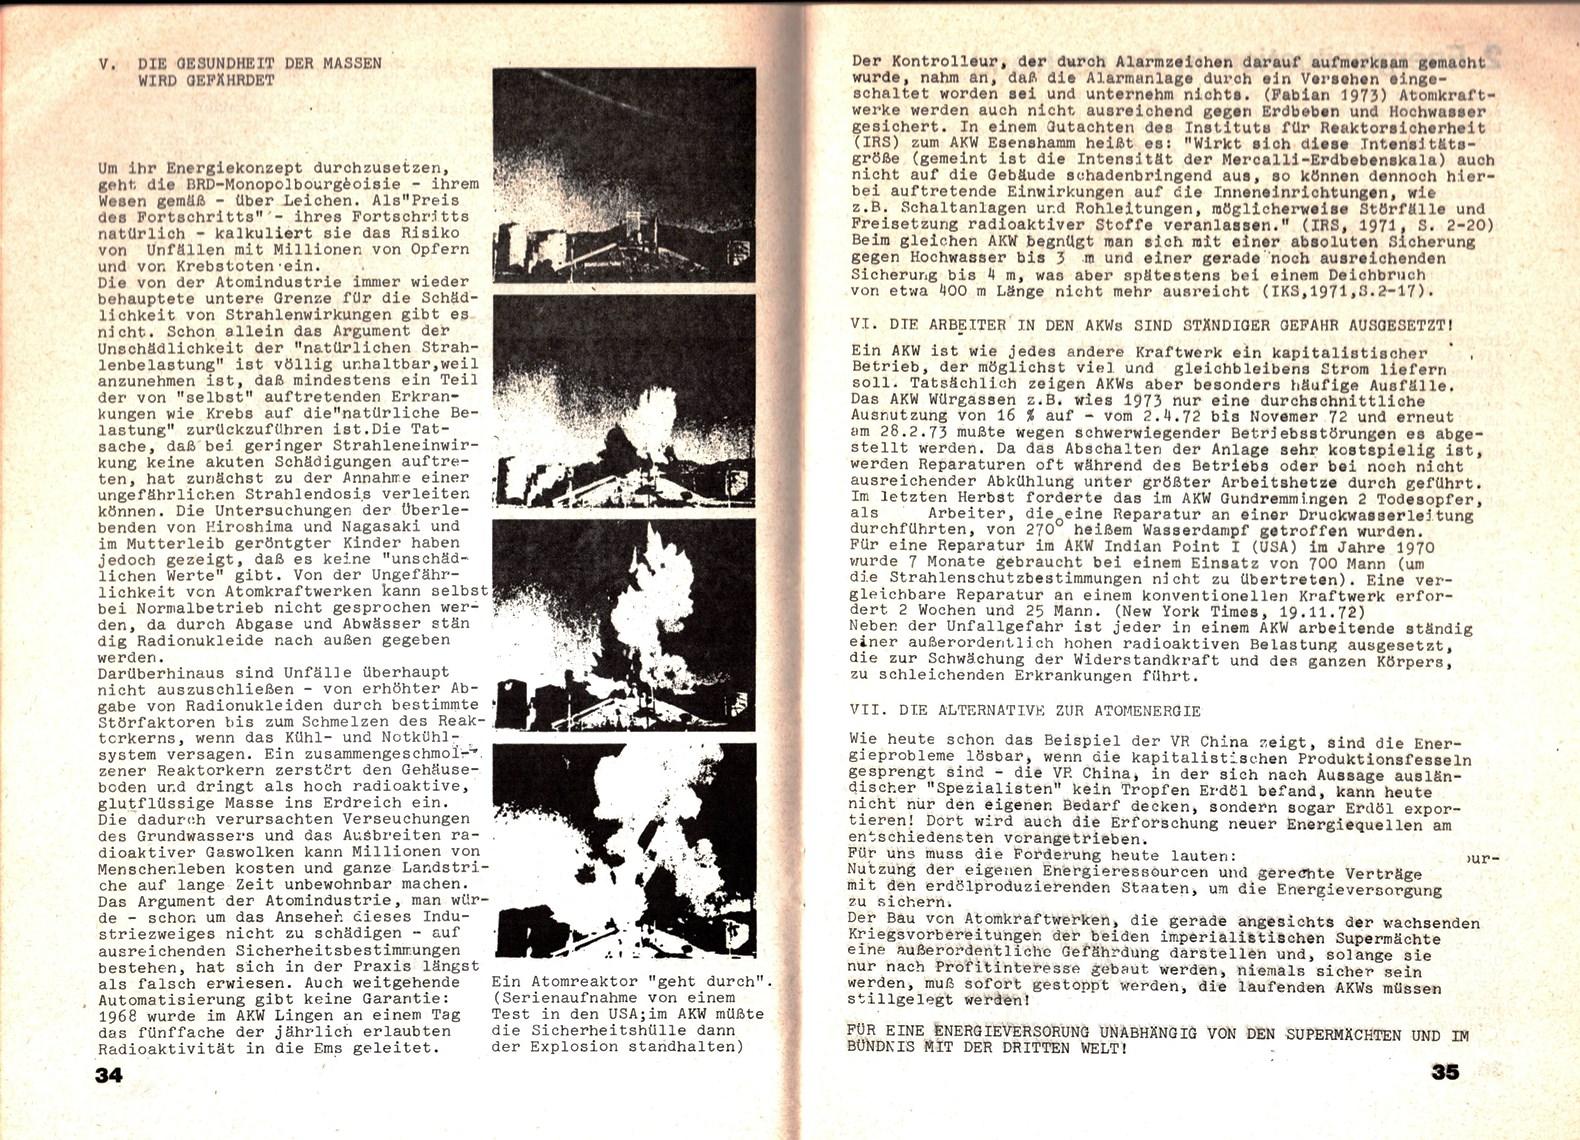 KSV_1976_Atomenergie_im_Kapitalismus_019